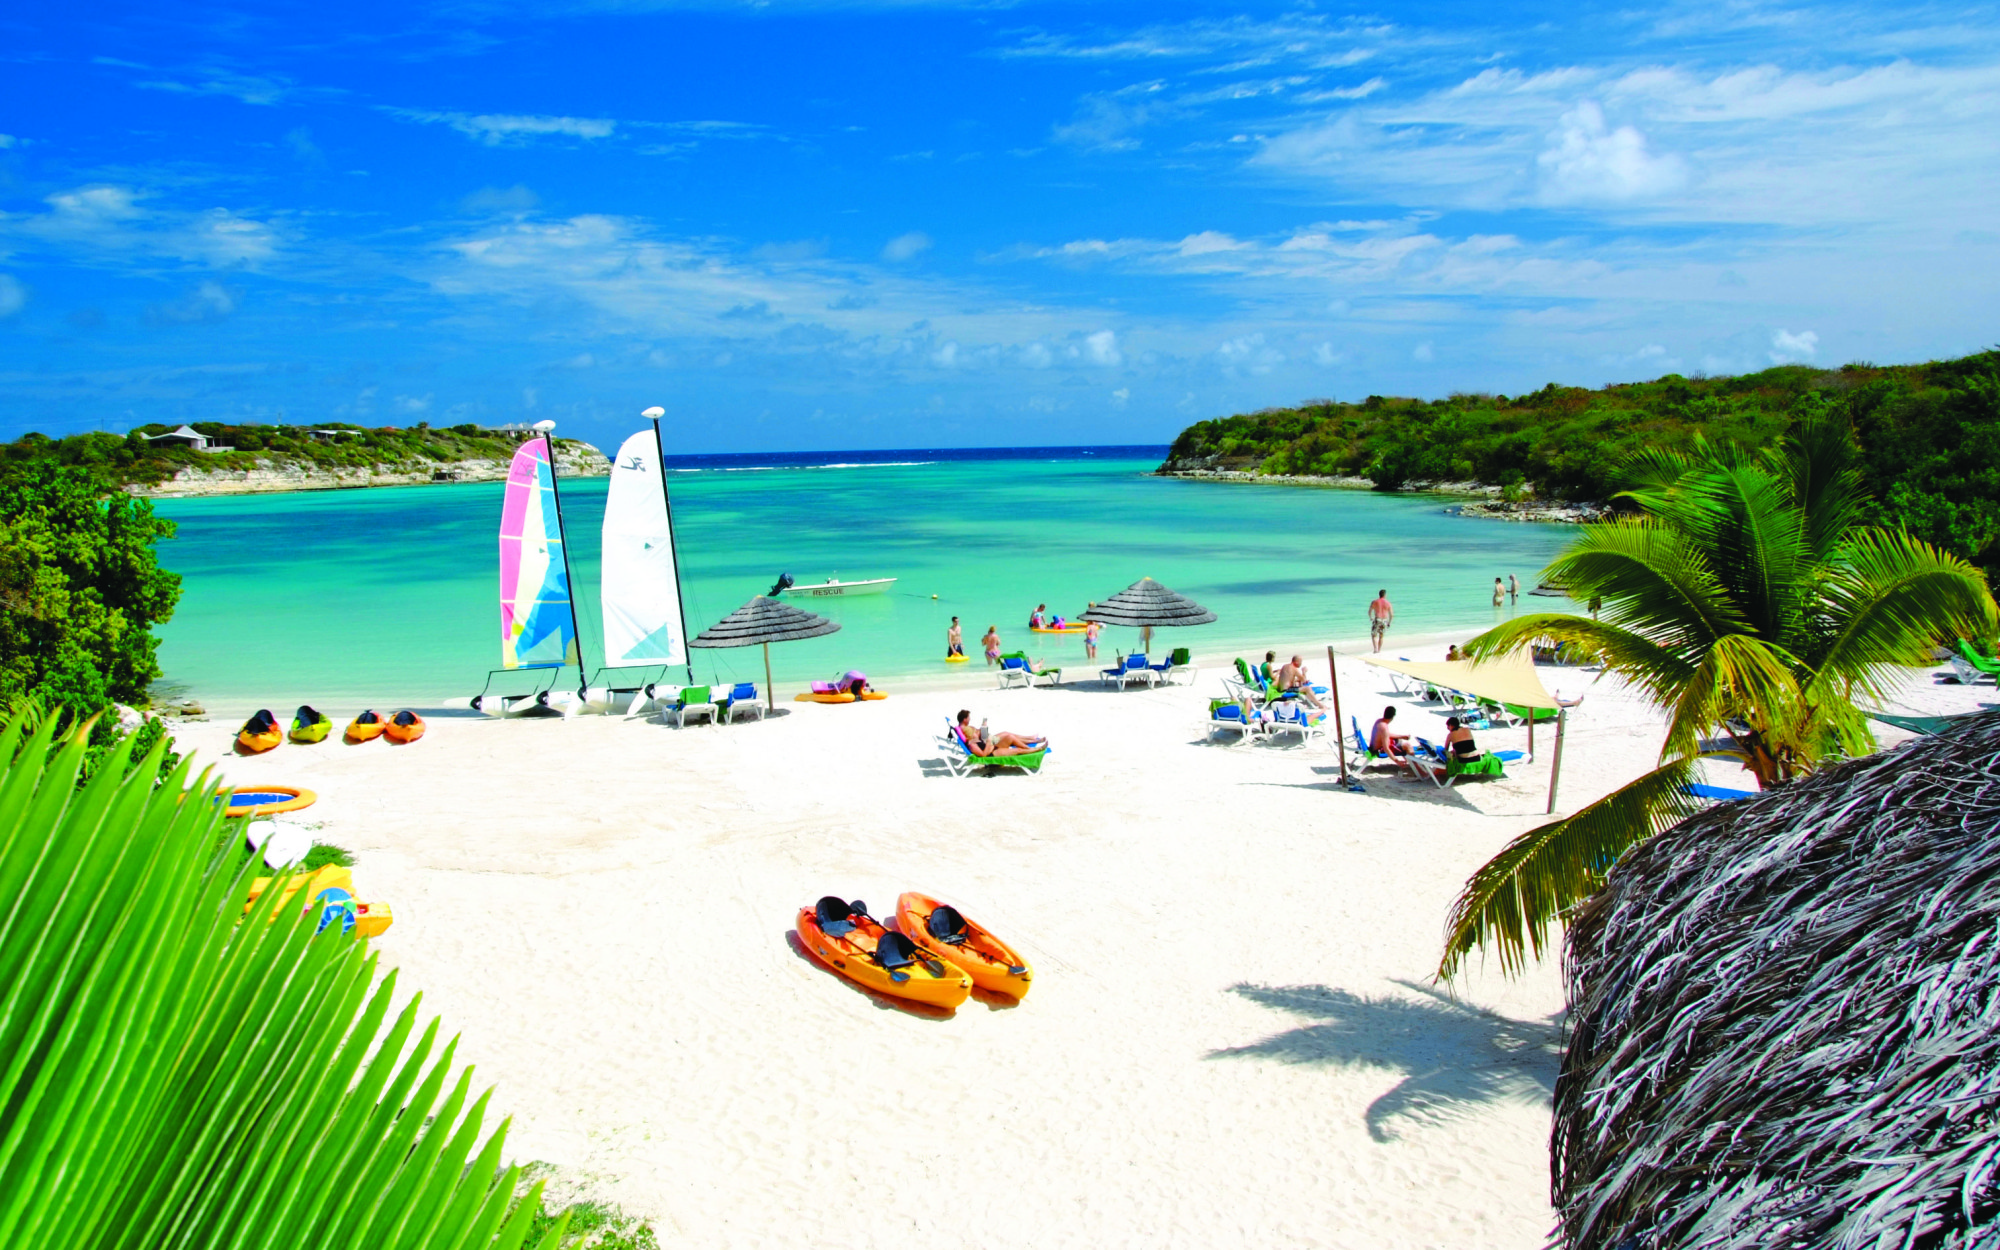 Verandah Beach Resort Antigua|Fleewinter tailor-made holidays